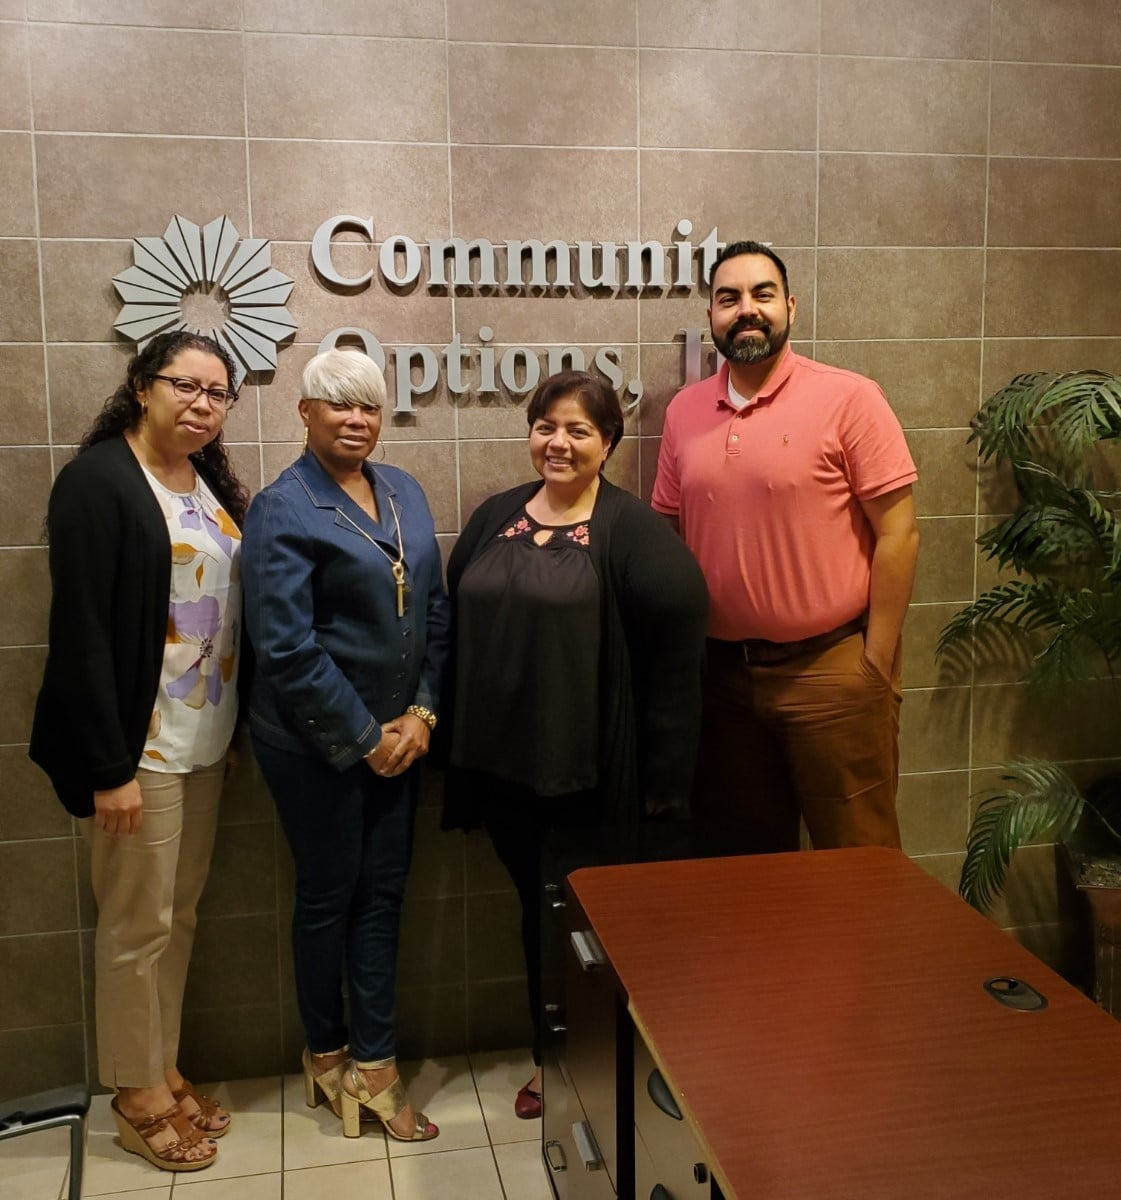 Community Options, Inc. of San Antonio, TX